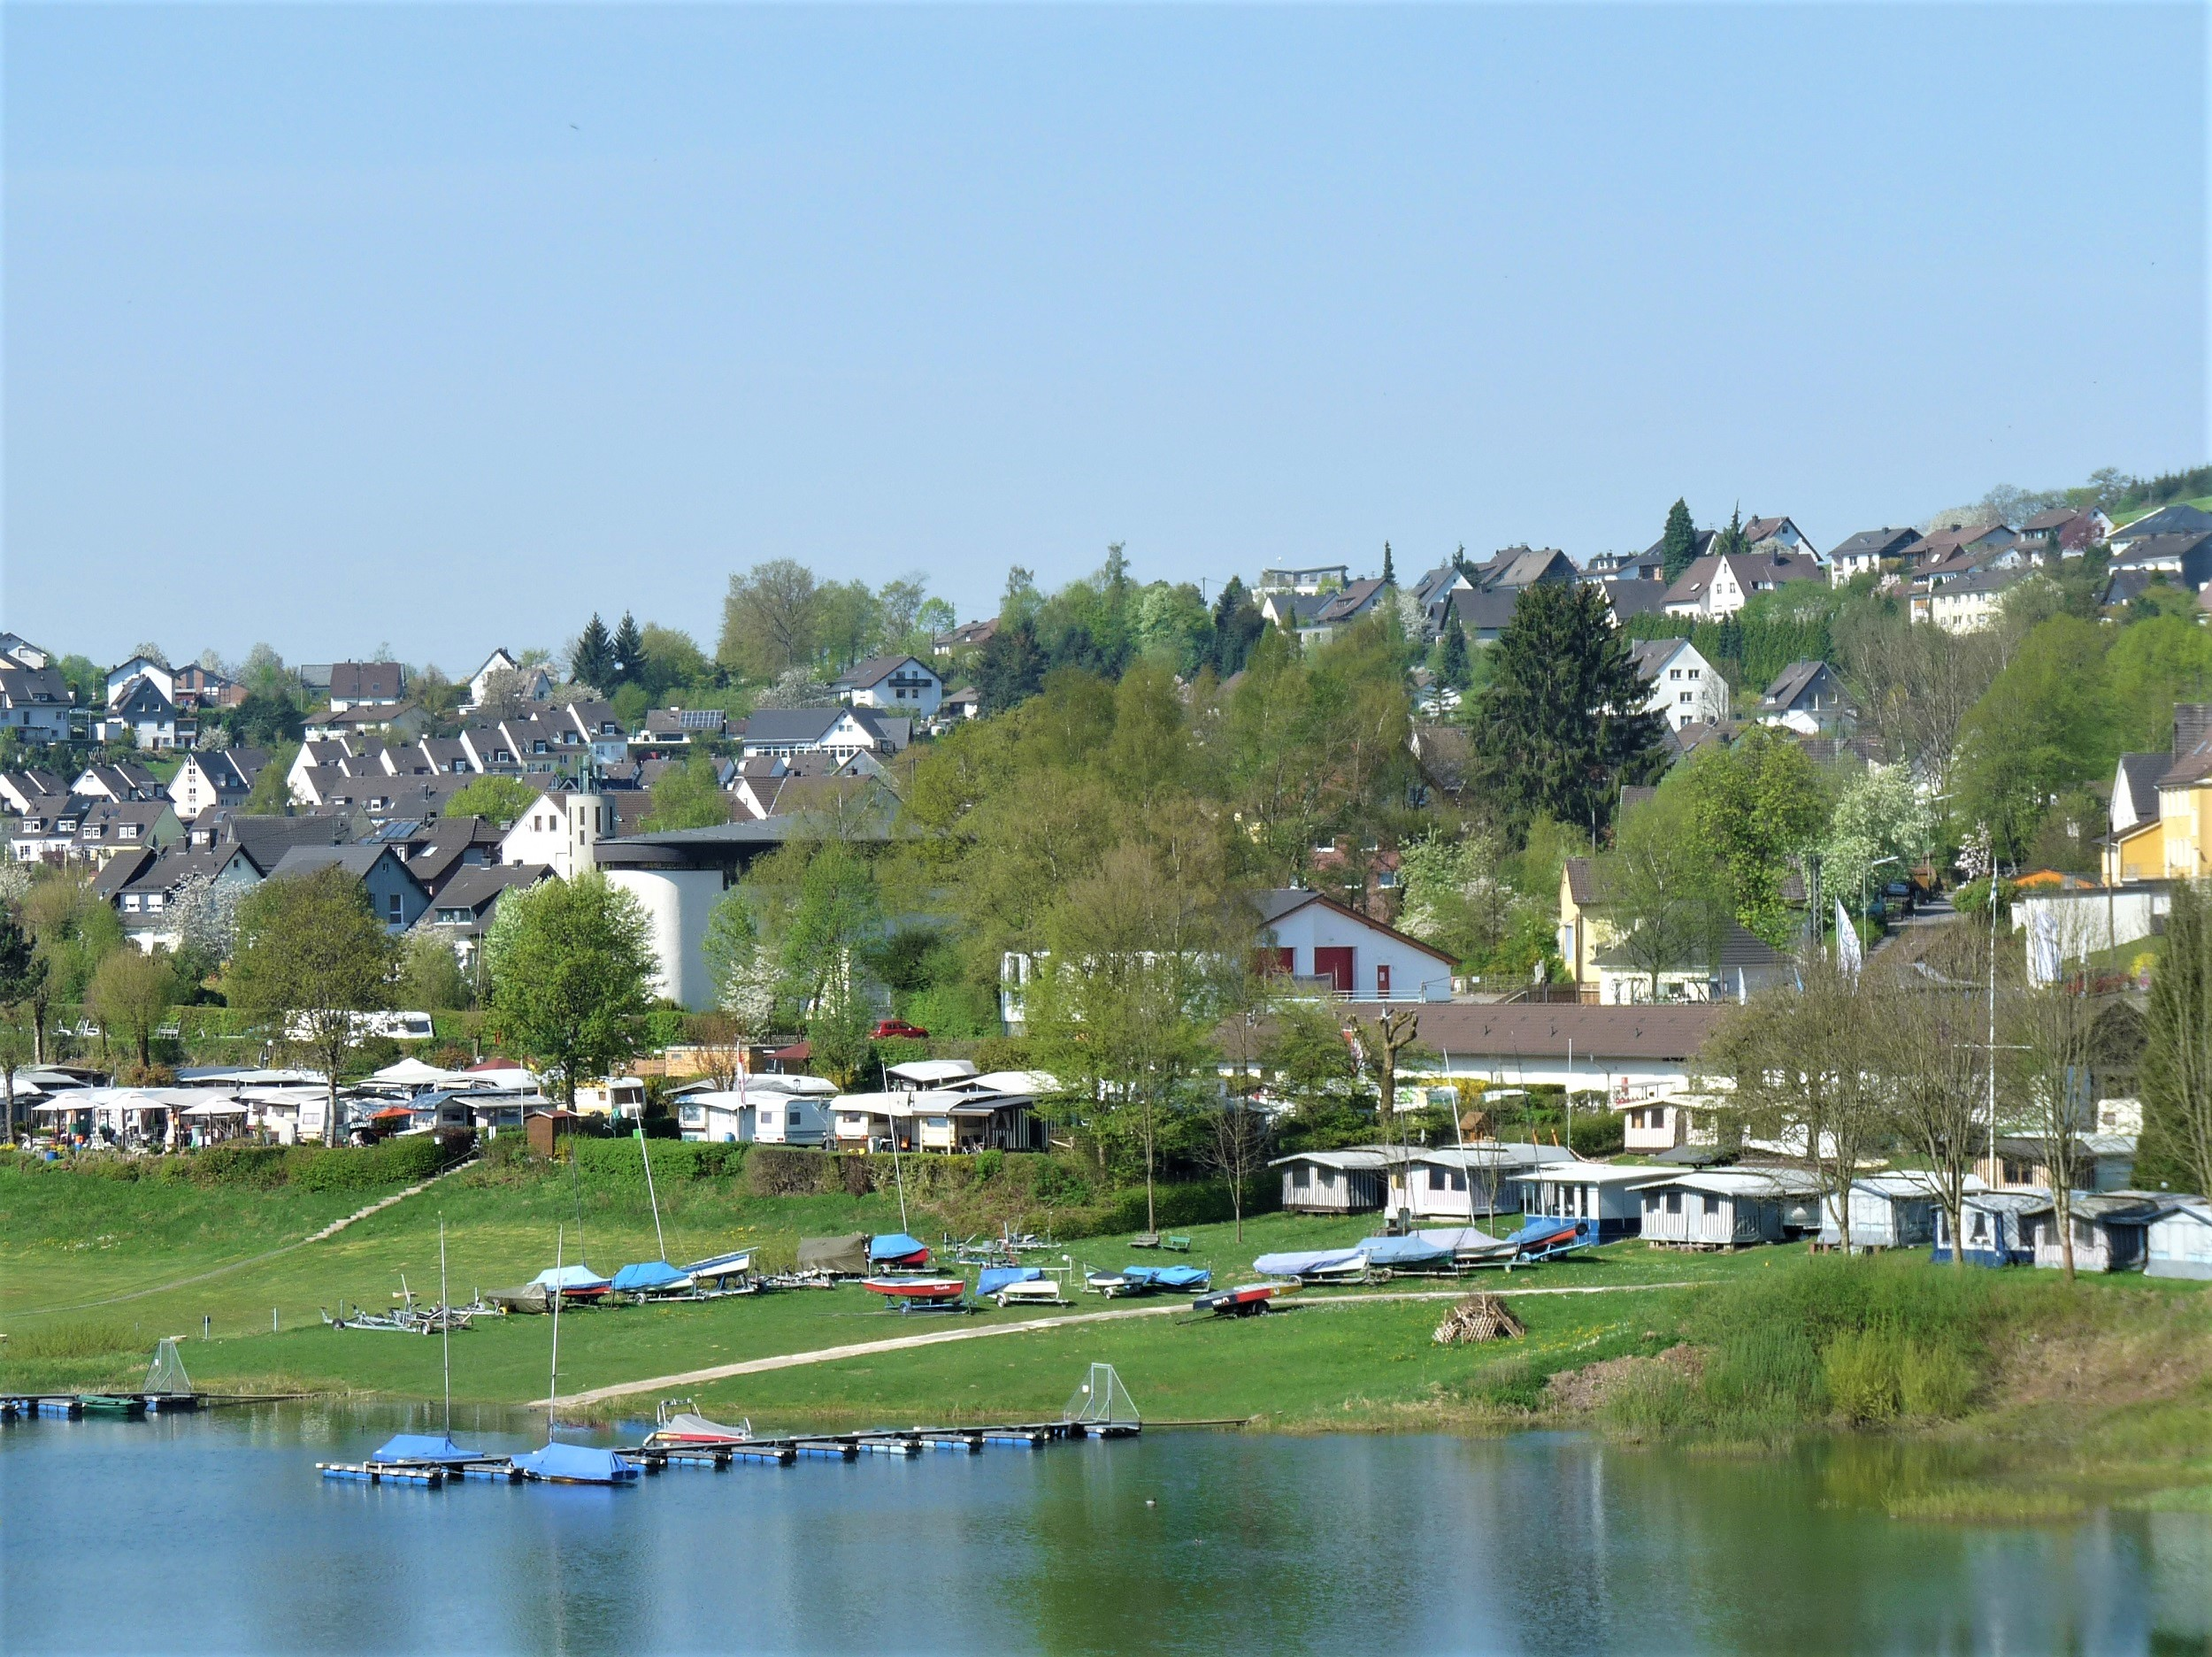 Lantenbach - Bootfahren auf der Aggertalsperre